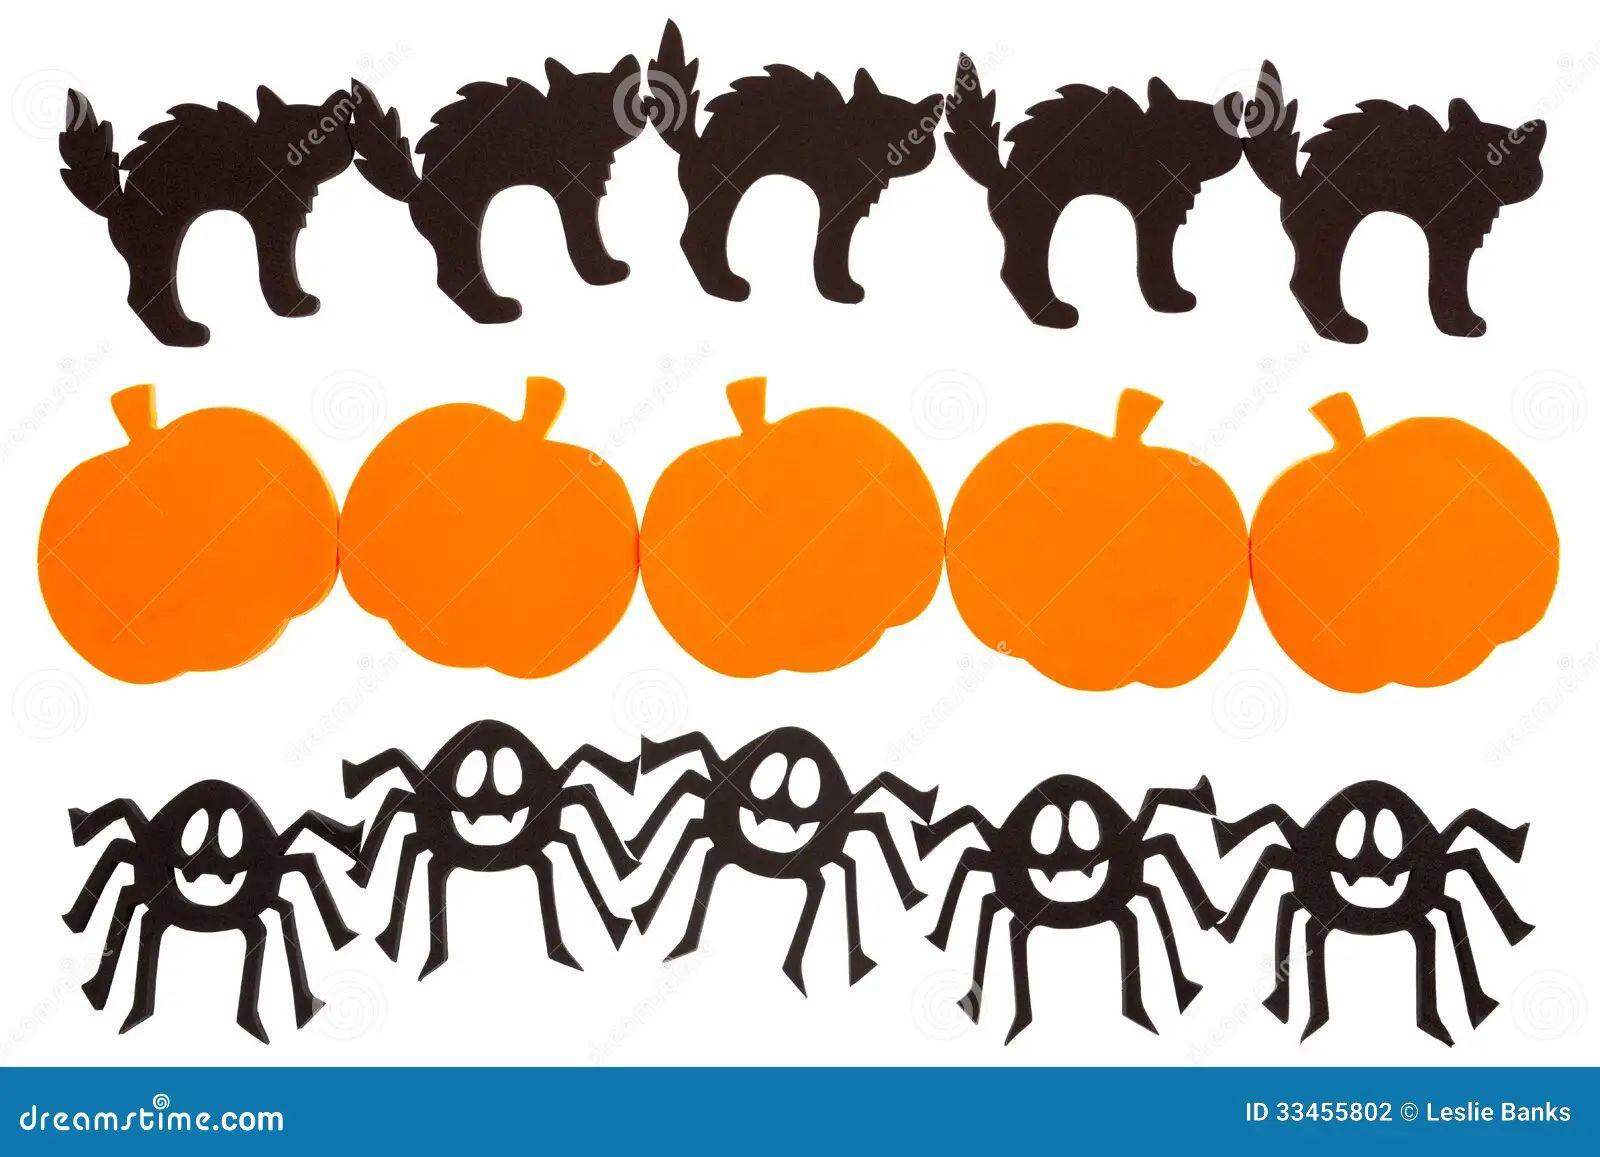 printable halloween decorations afro halloween decorations download - Halloween Decorations Printable